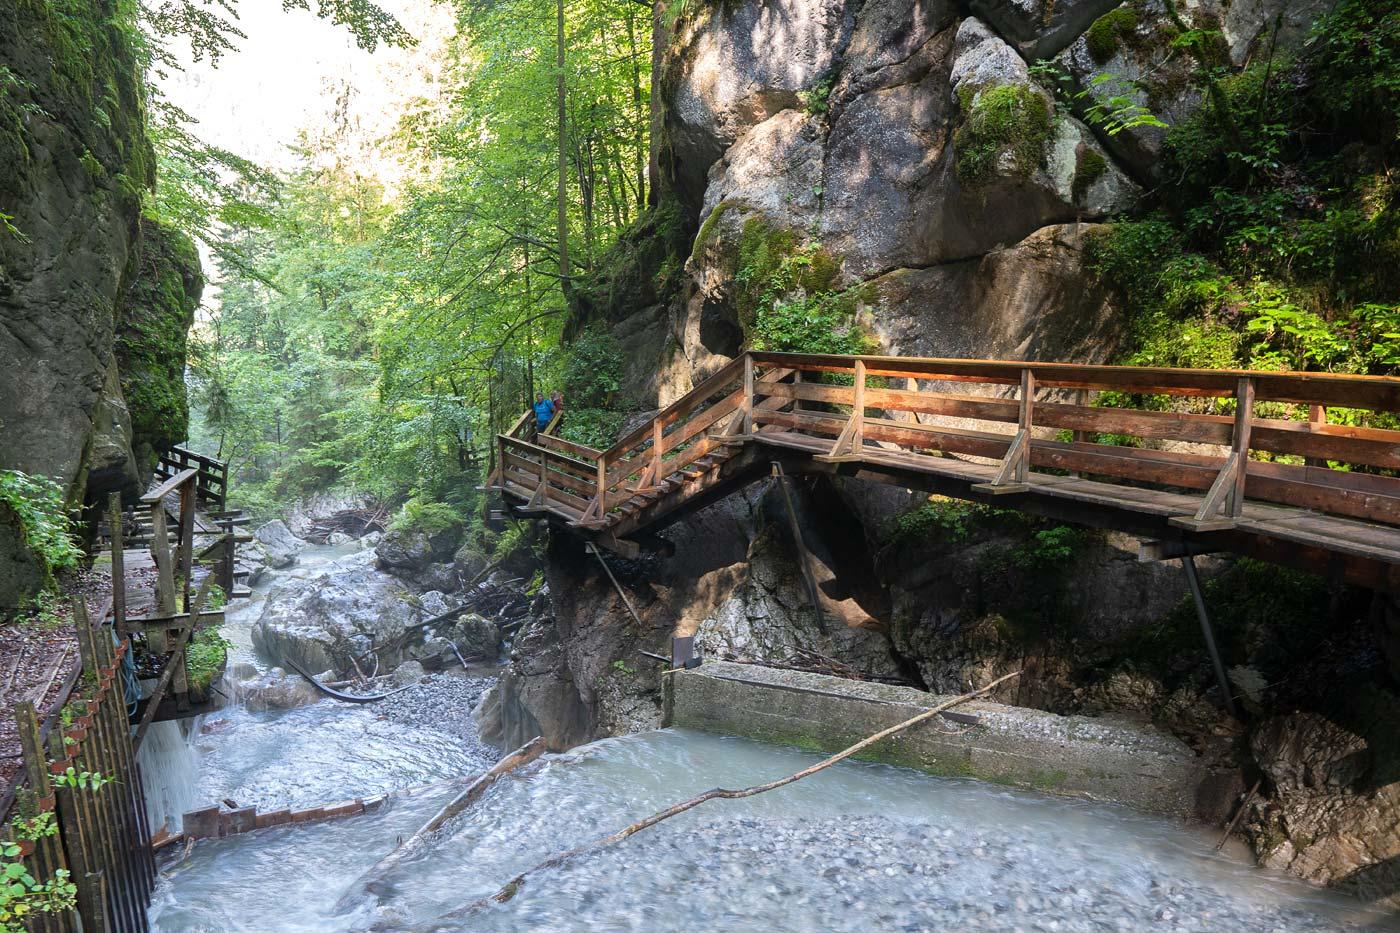 Ущелье Seisenbergklamm, долина Лофер, Австрия